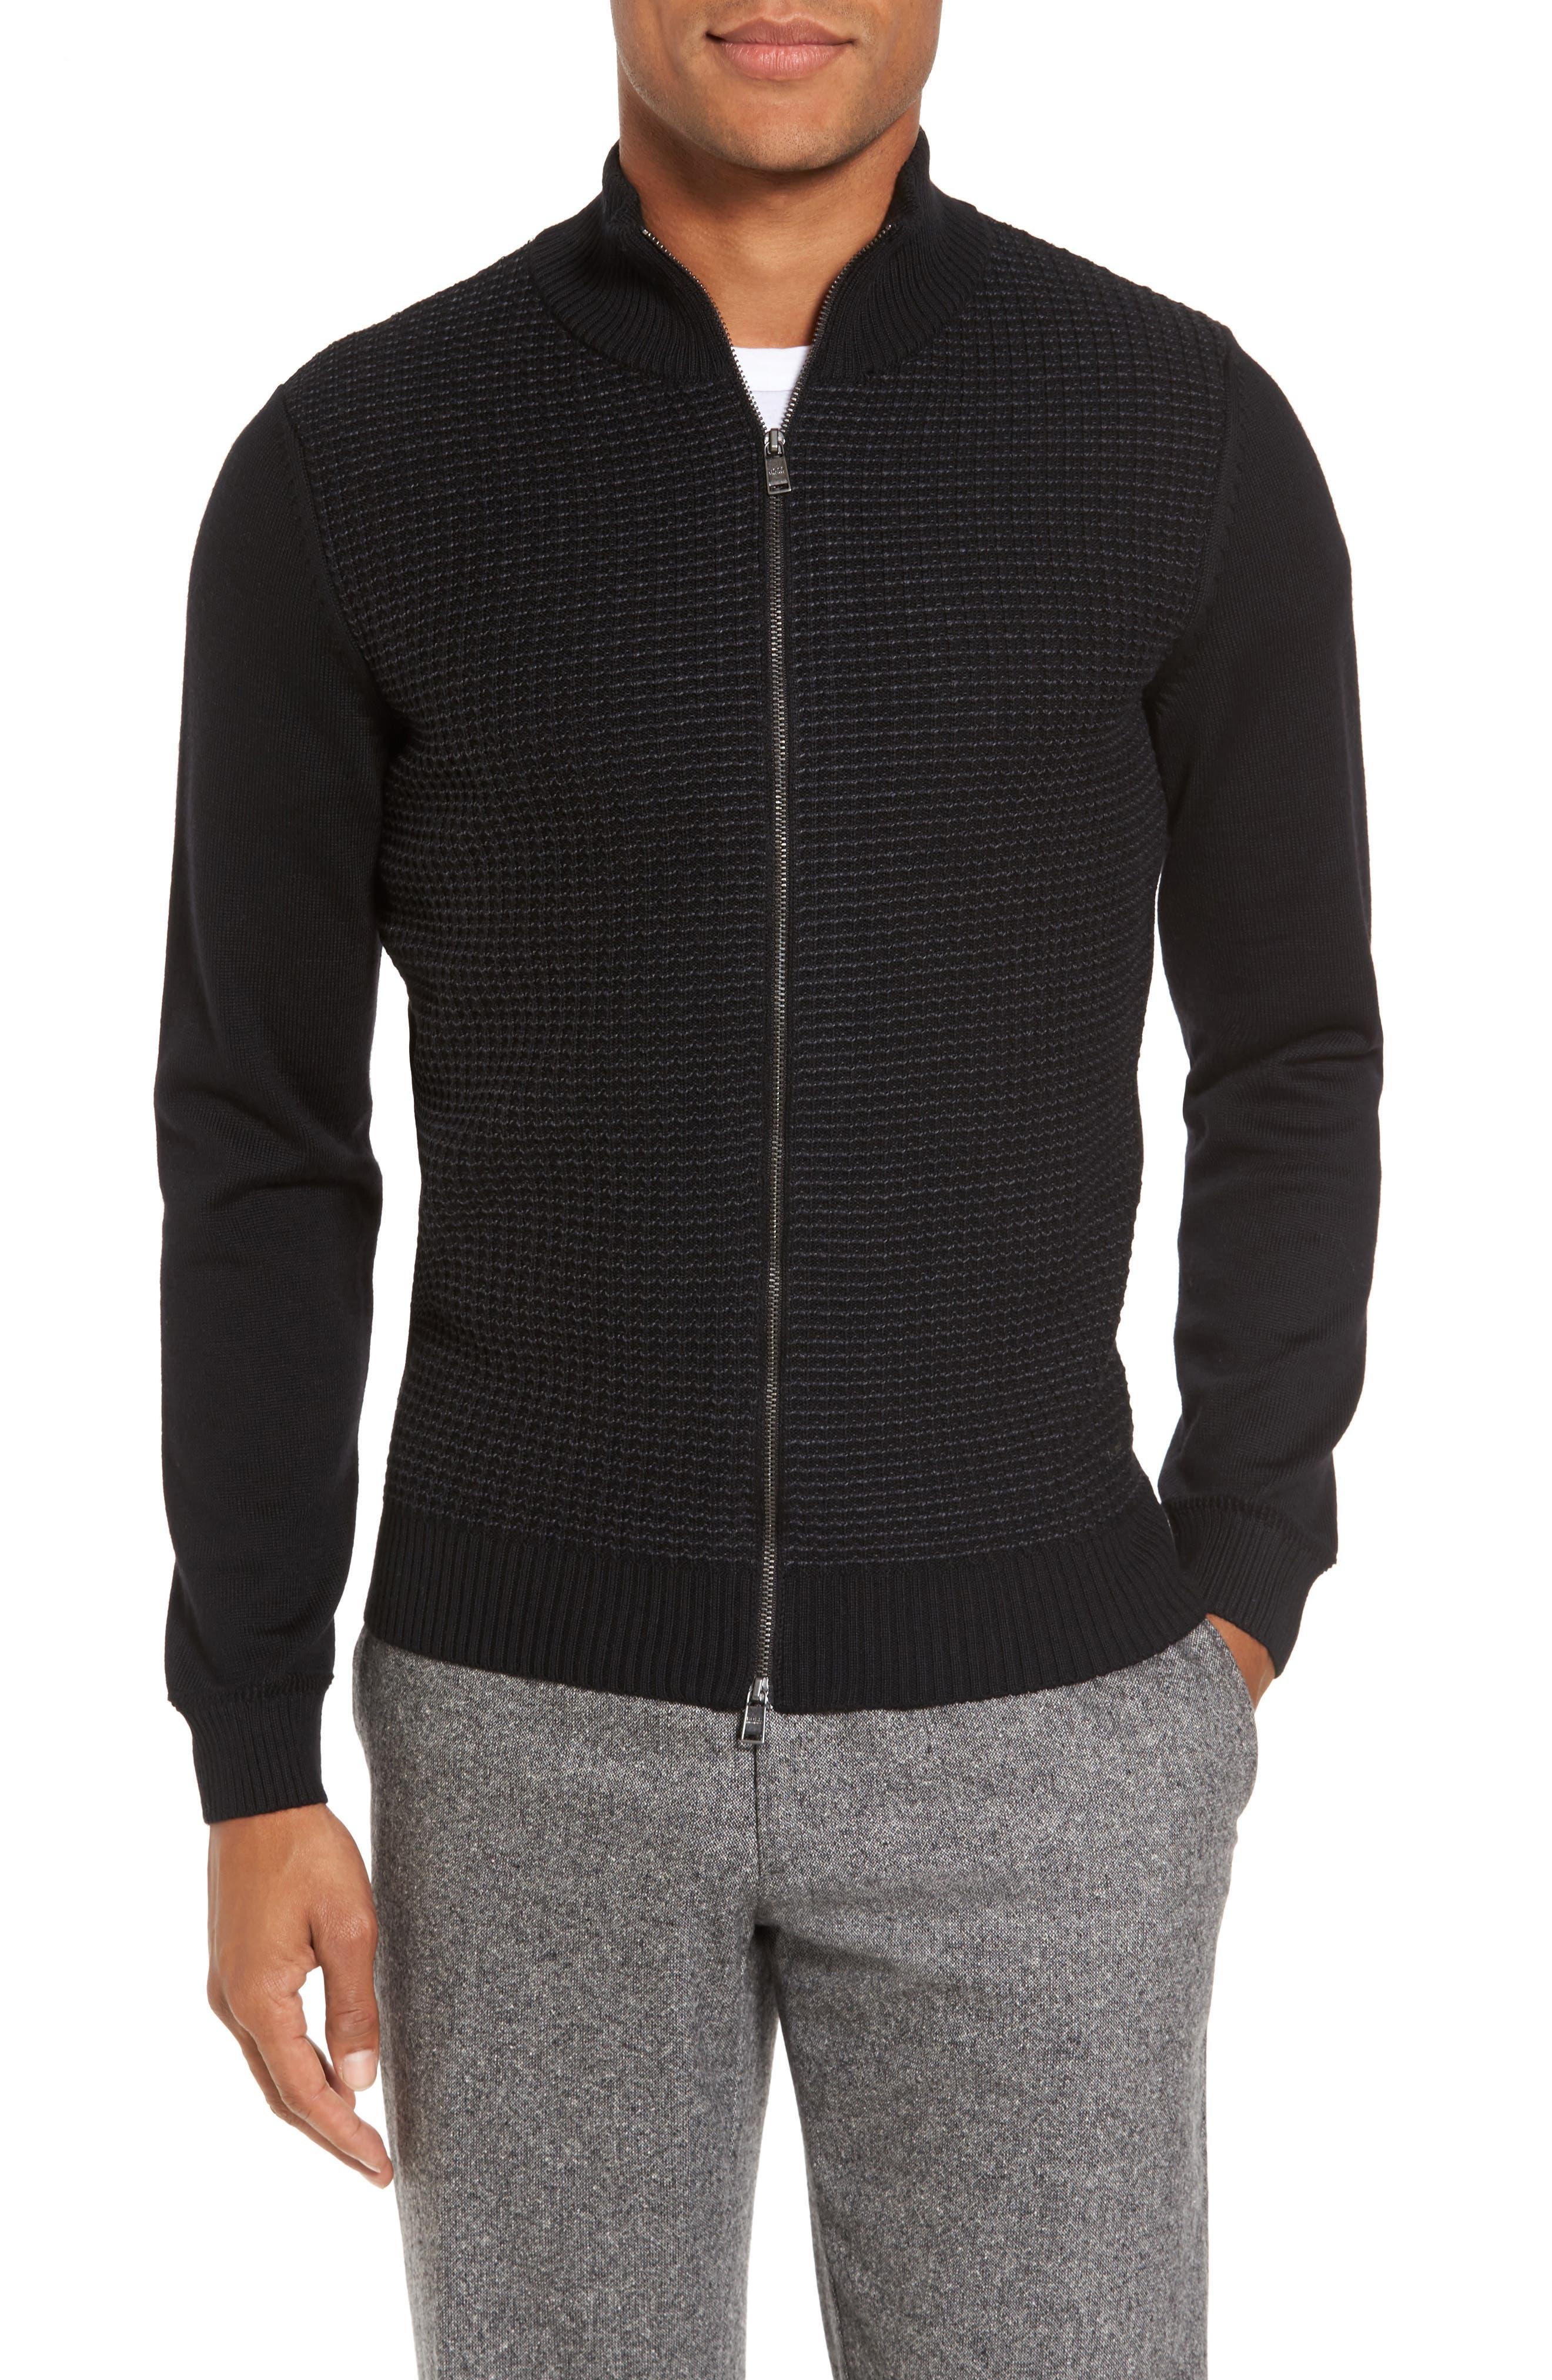 Main Image - BOSS Bacco Full Zip Wool Sweater Jacket